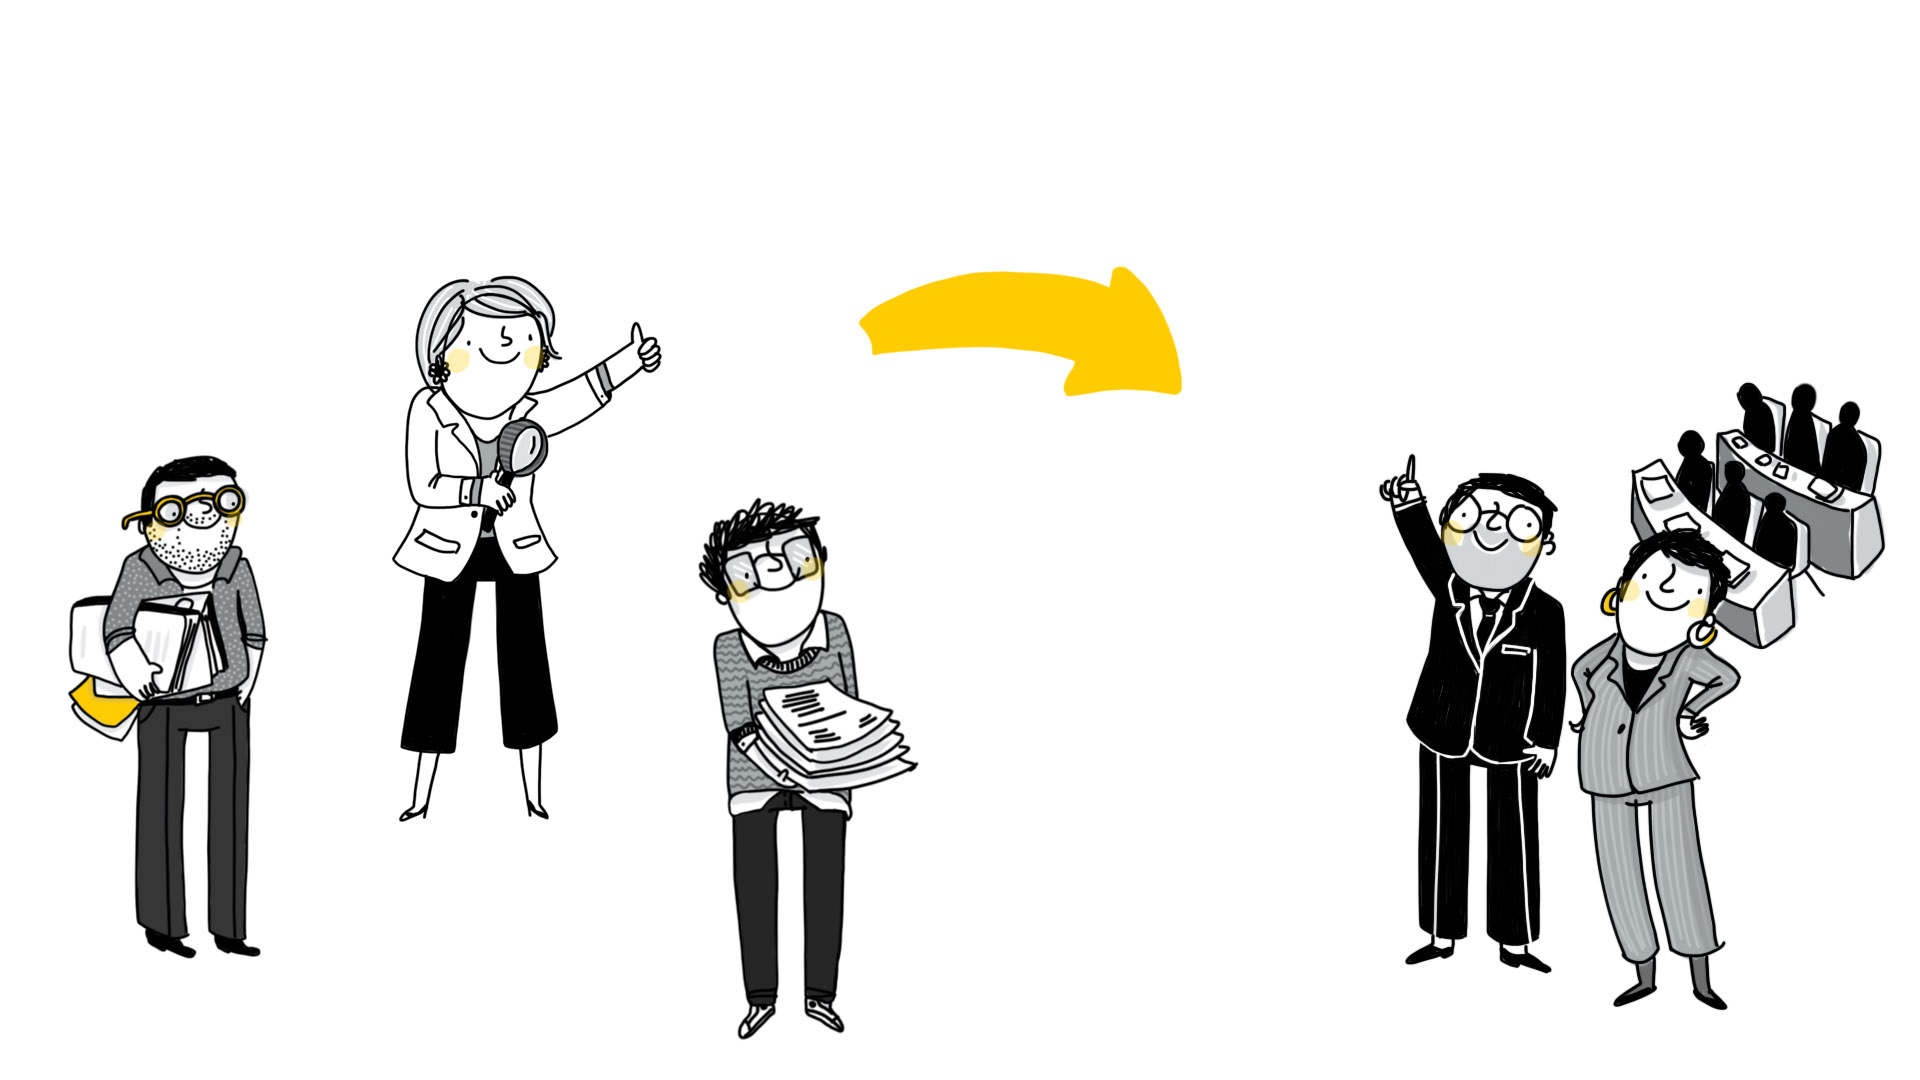 10_FINAL_PK_komjc_illustrationen_frolleinmotte_feb07.jpg